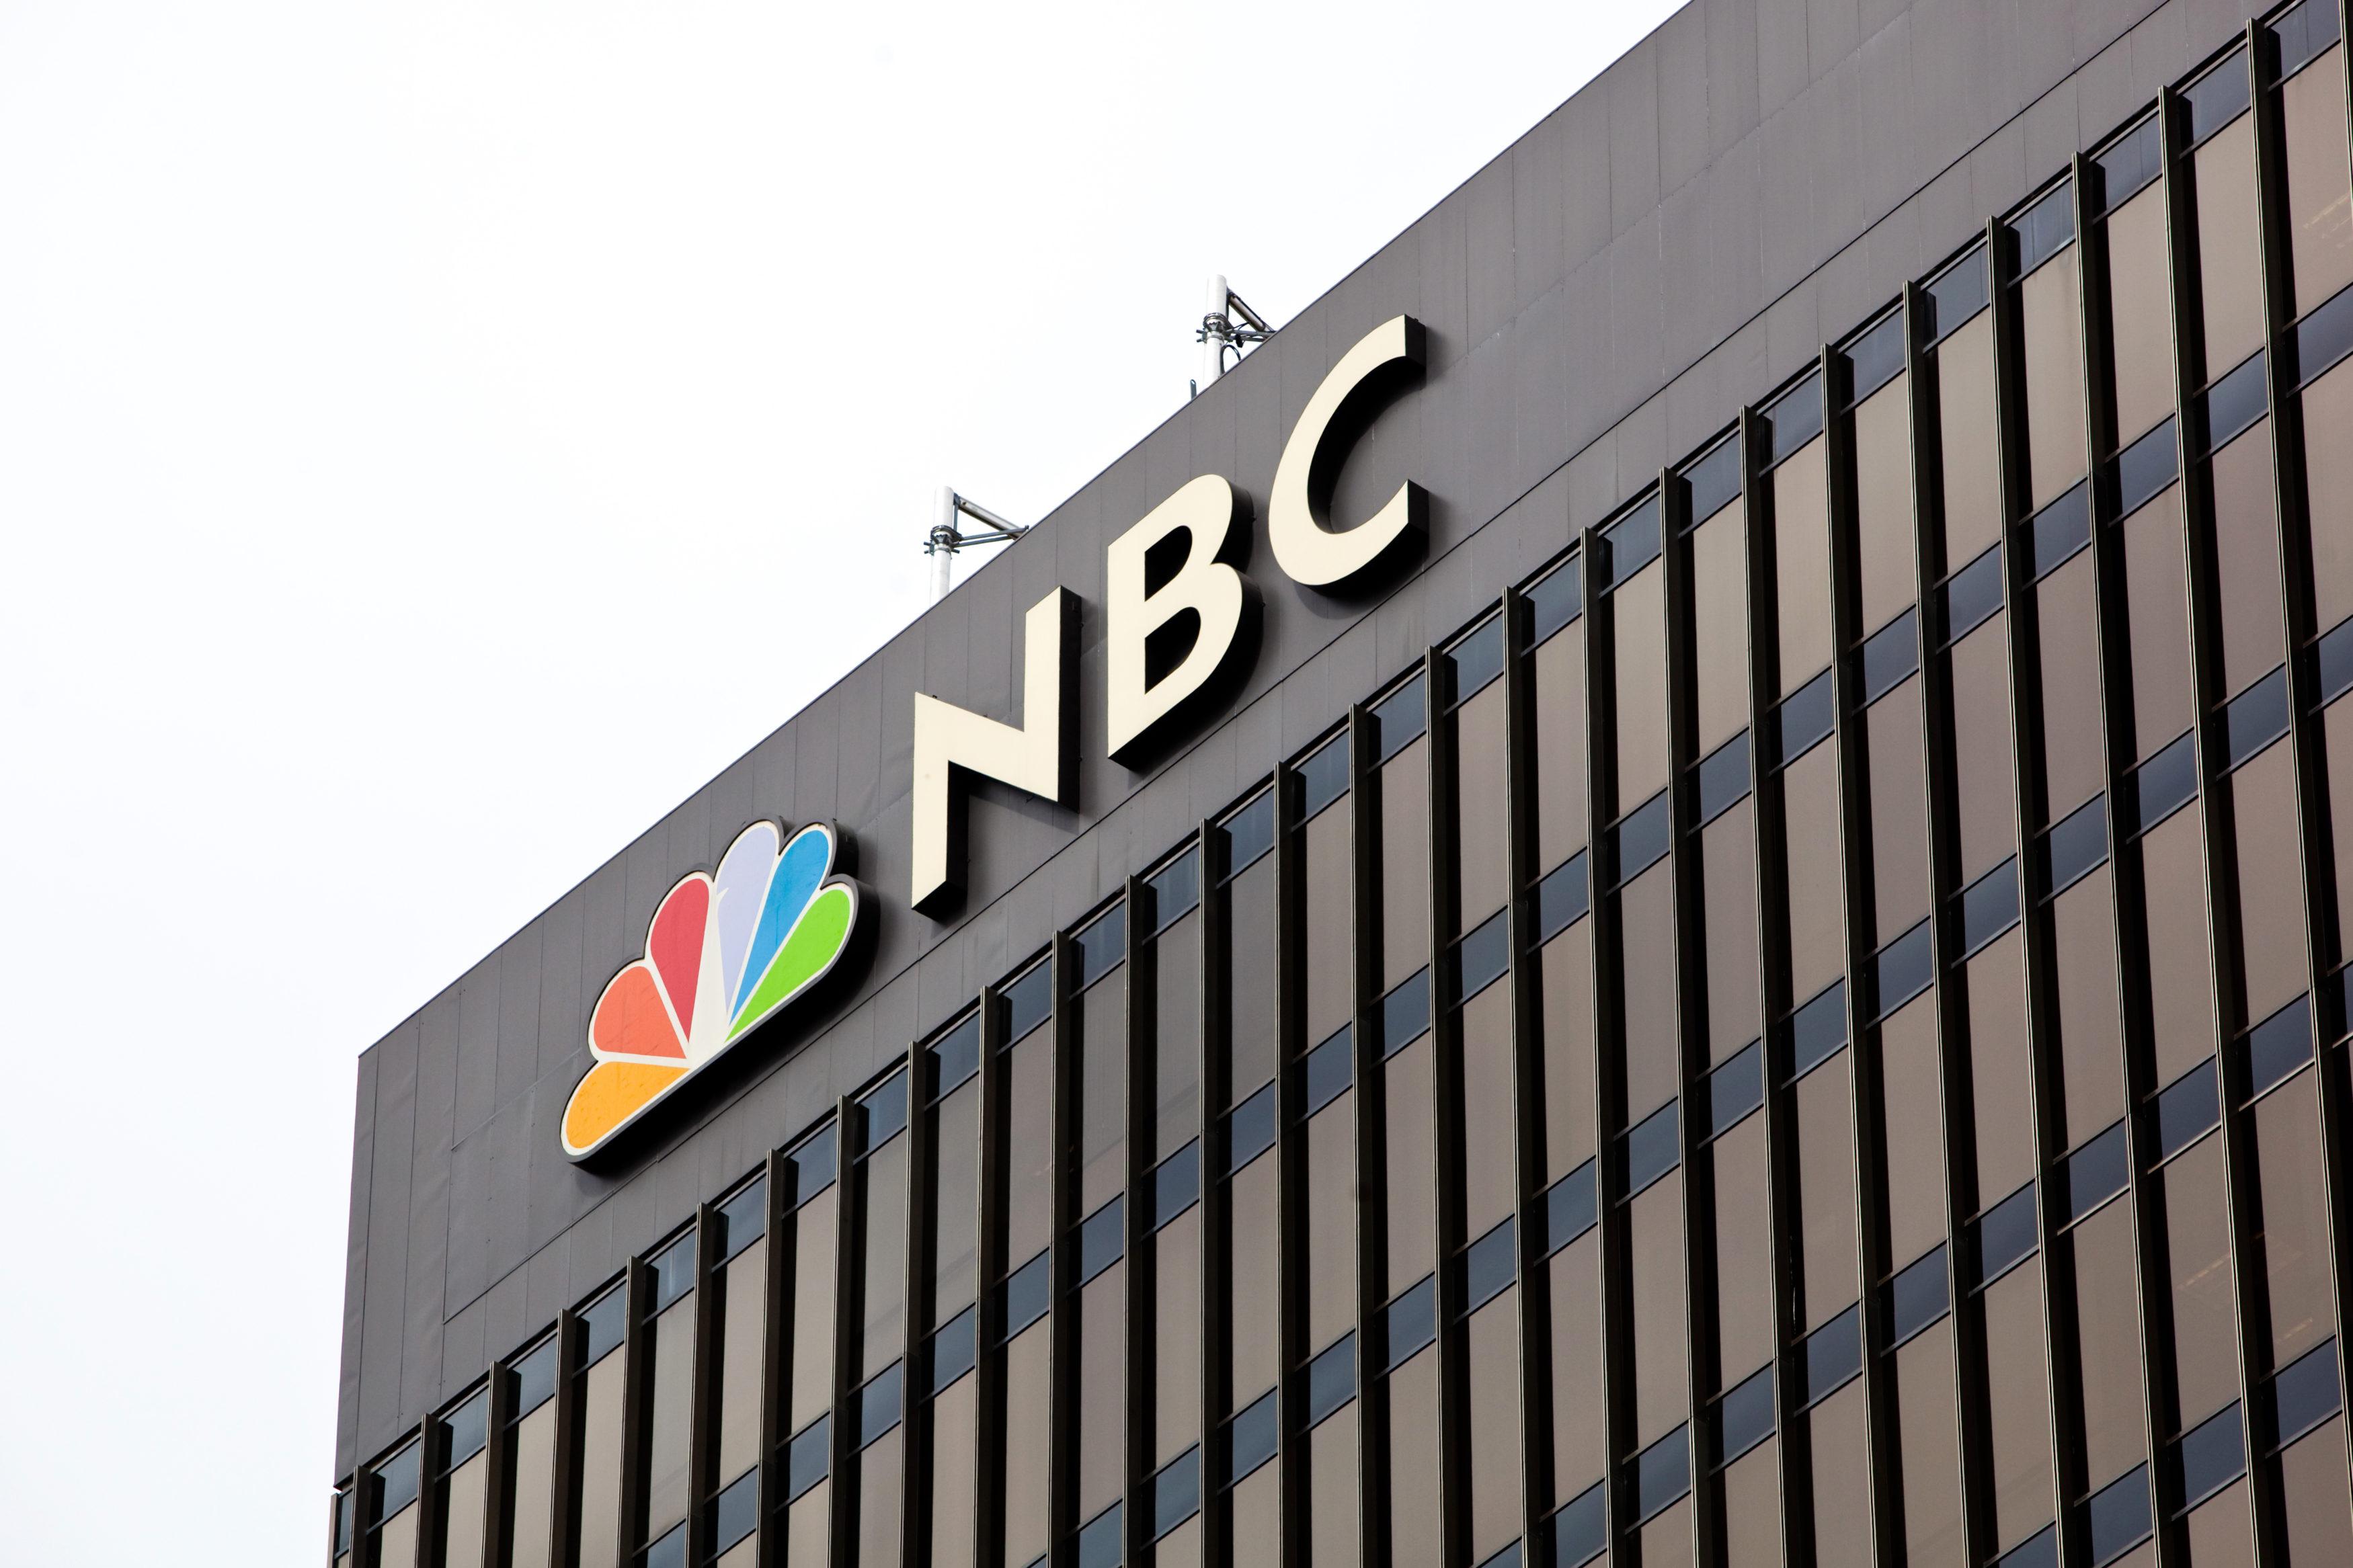 nbc-corporate-media-3500x2333.jpg